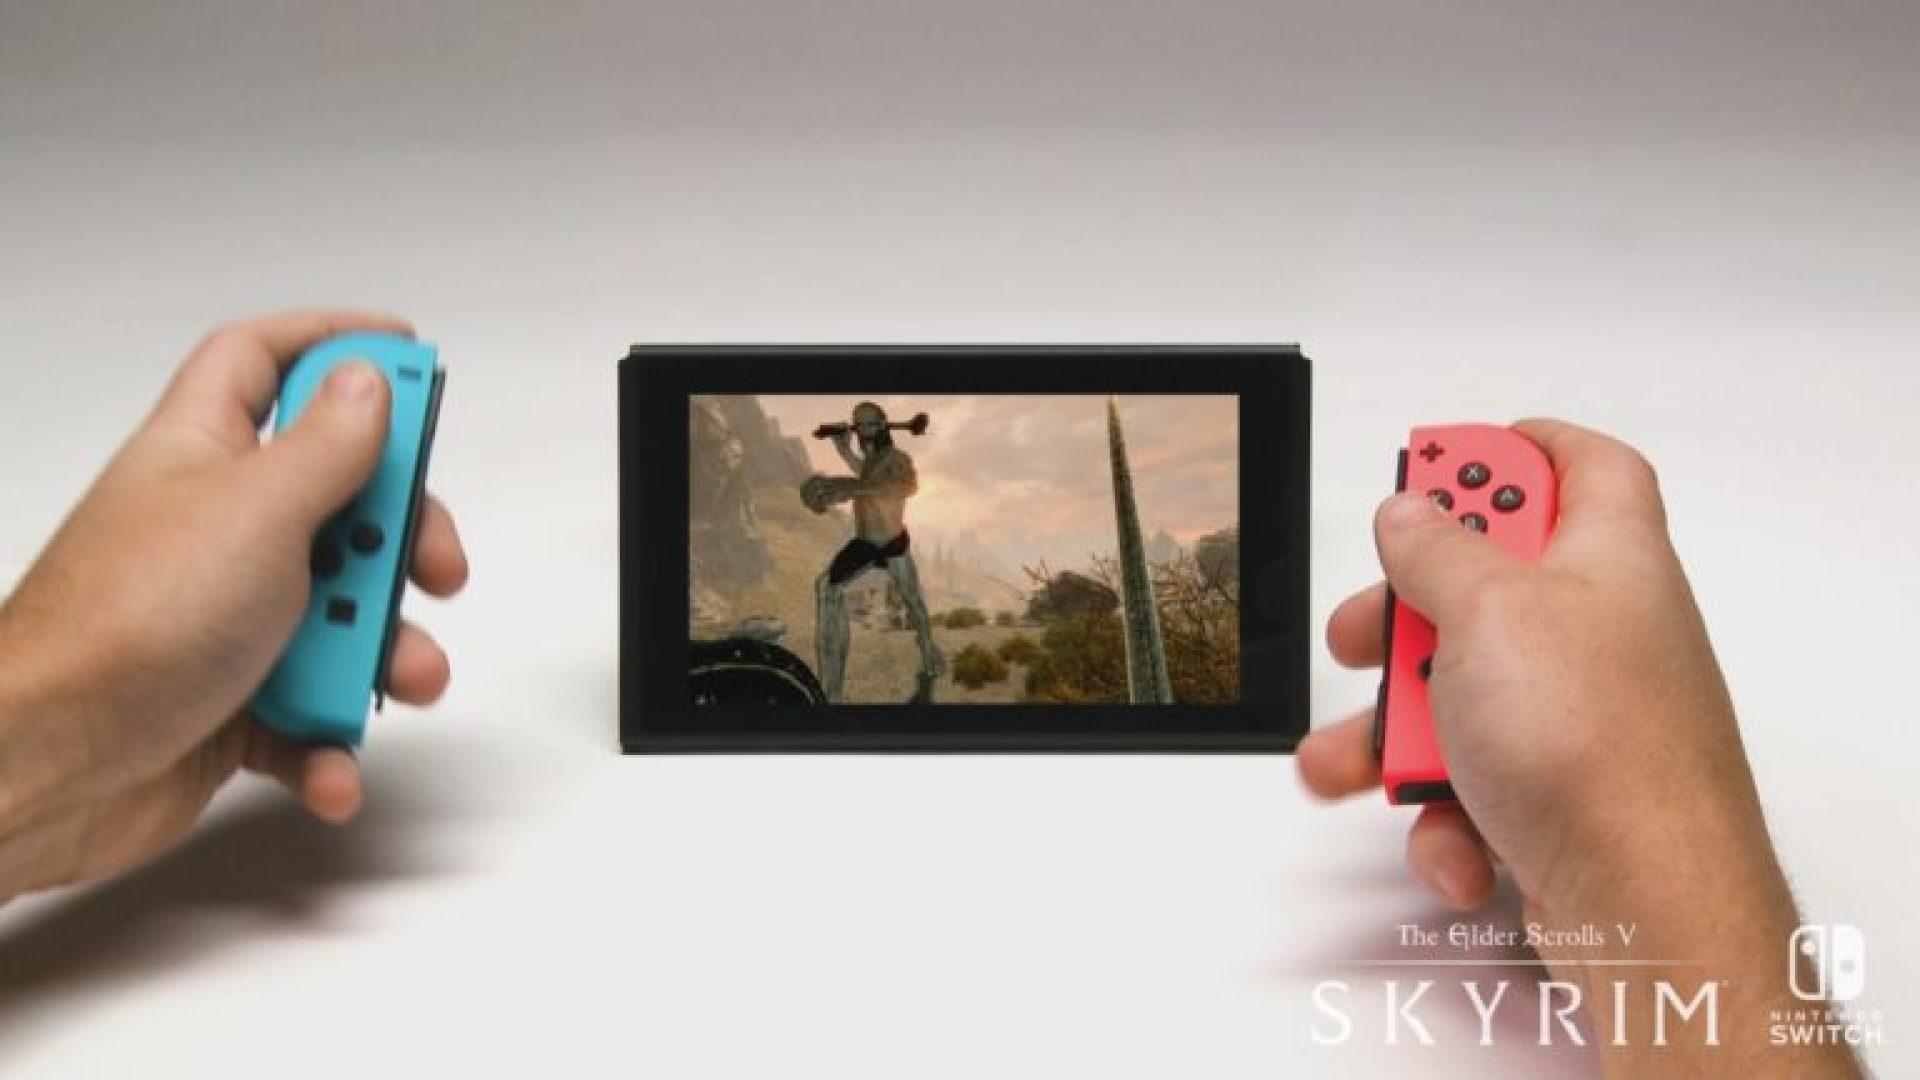 Skyrim - Switch Review | PowerUp!